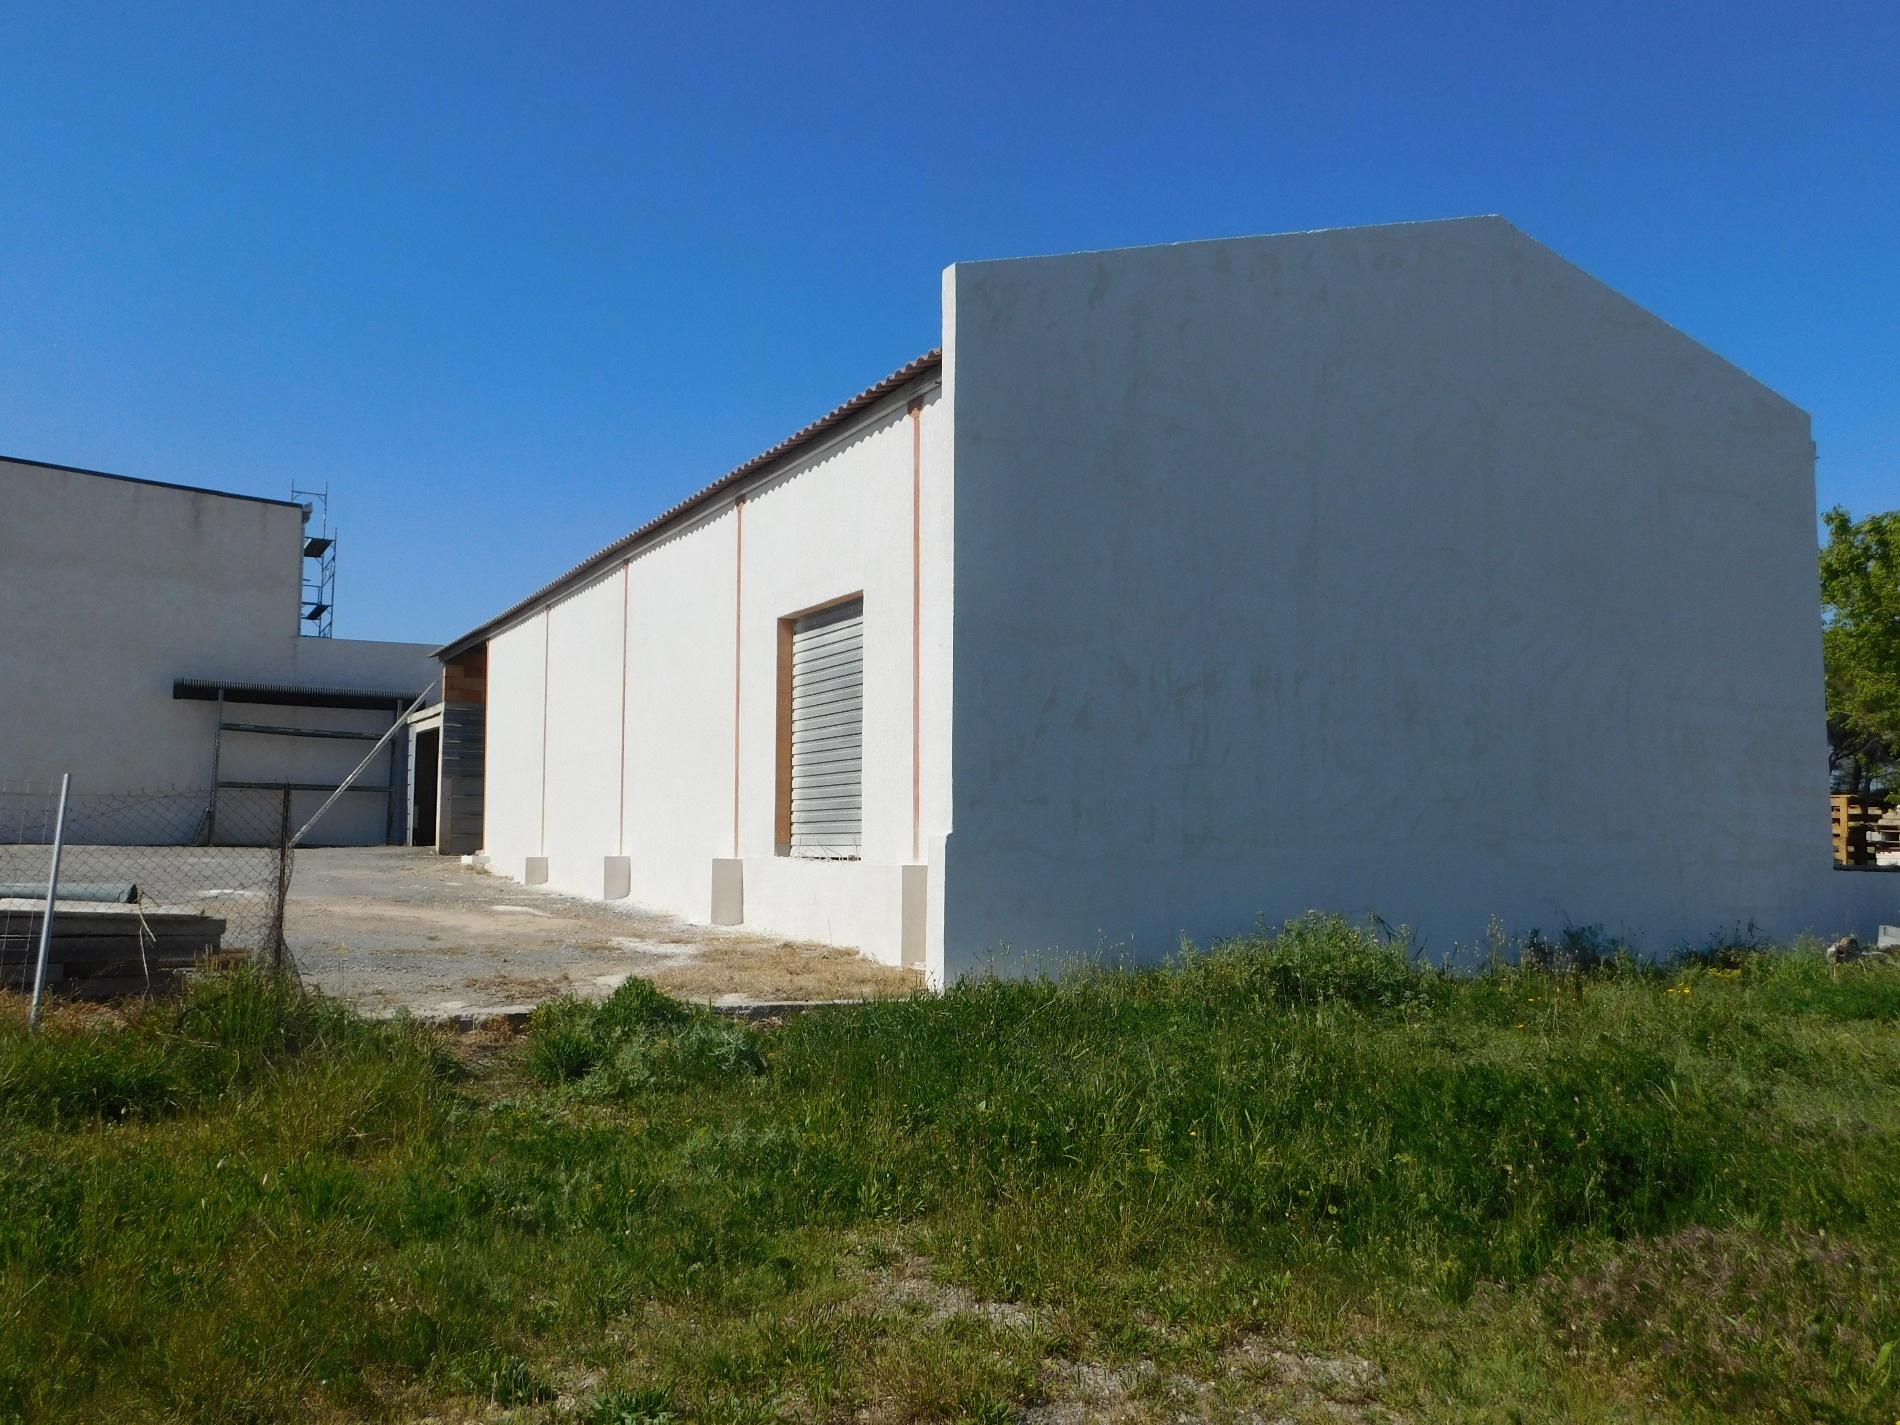 Vente Immobilier Professionnel Local professionnel Mèze (34140)